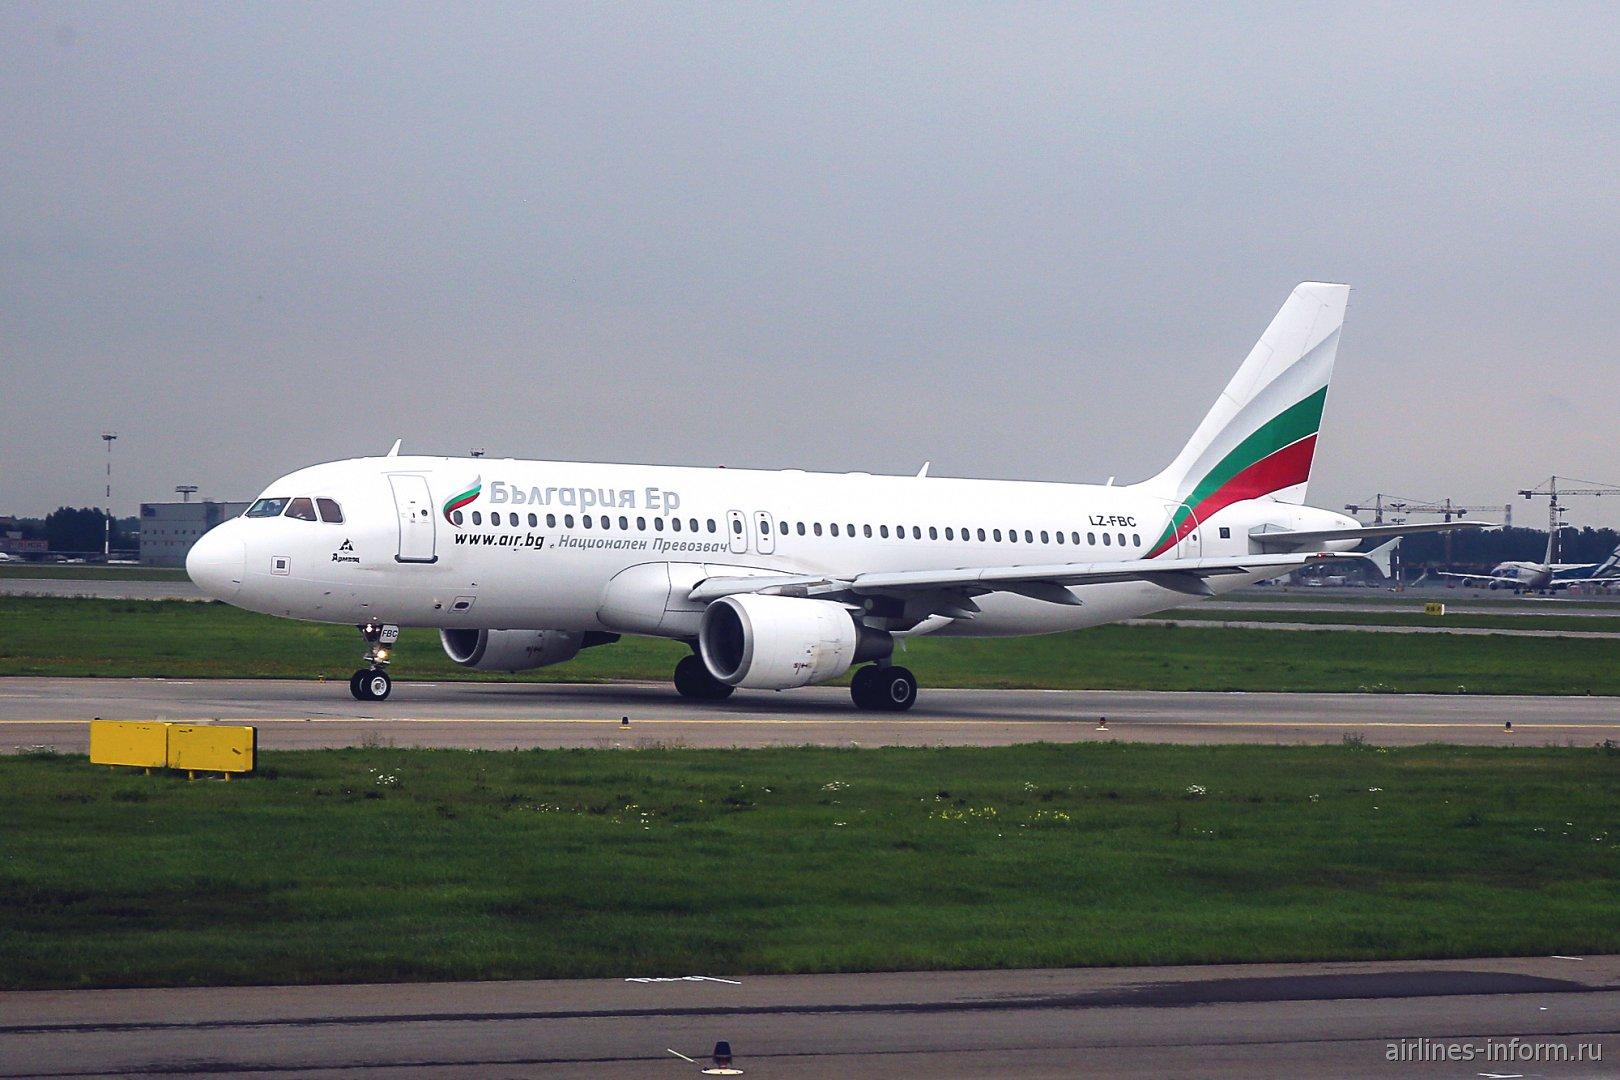 Авиалайнер Airbus A320 LZ-FBC авиакомпании Bulgaria Air в аэропорту Москва Шереметьево